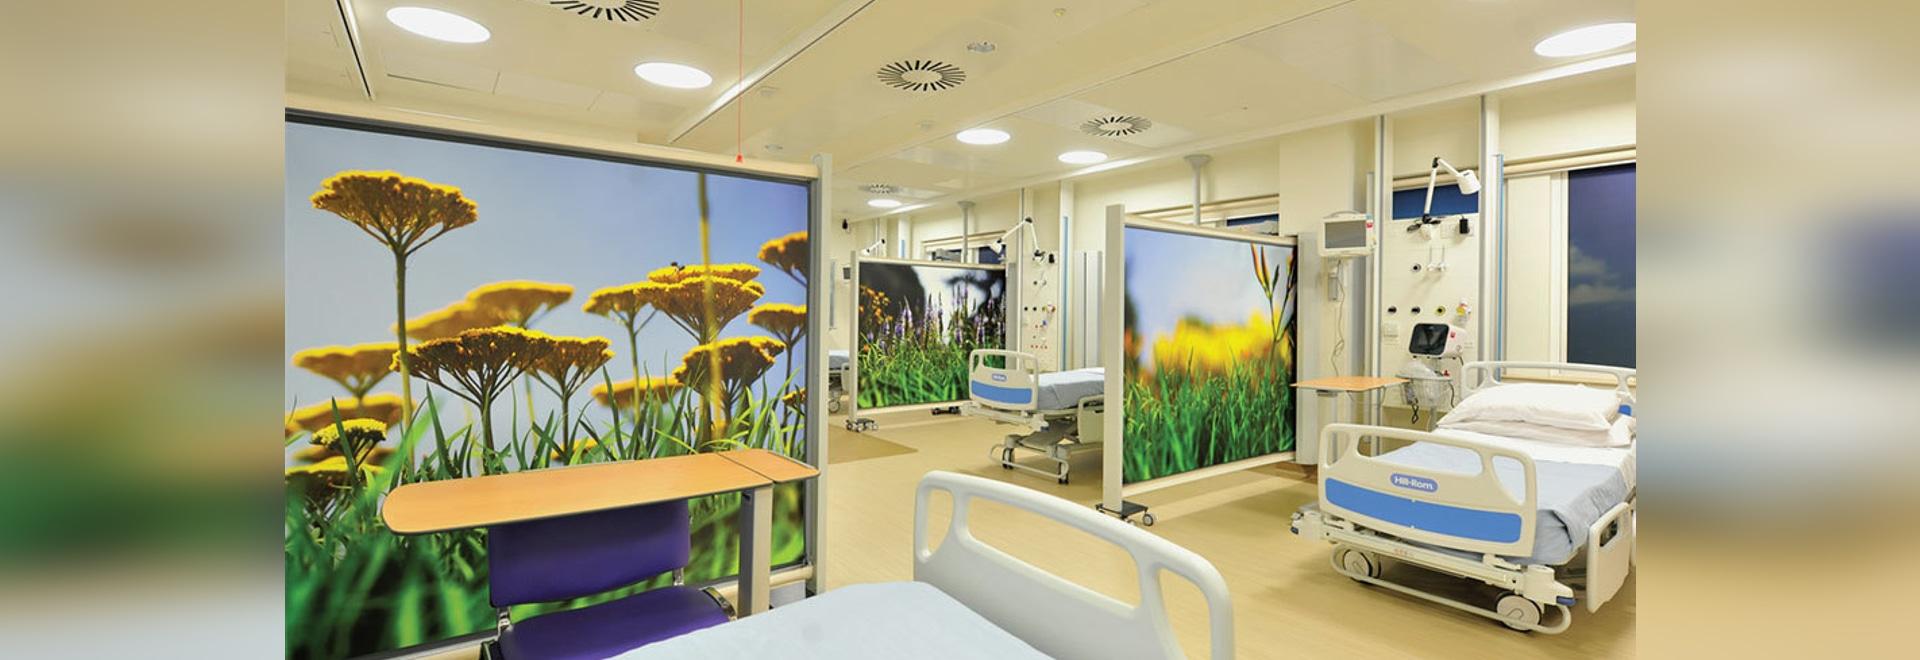 Hospital privacy screens on wheels KwickScreens at hospital ward in The National Hospital for Neurology and Neurosurgery, London.